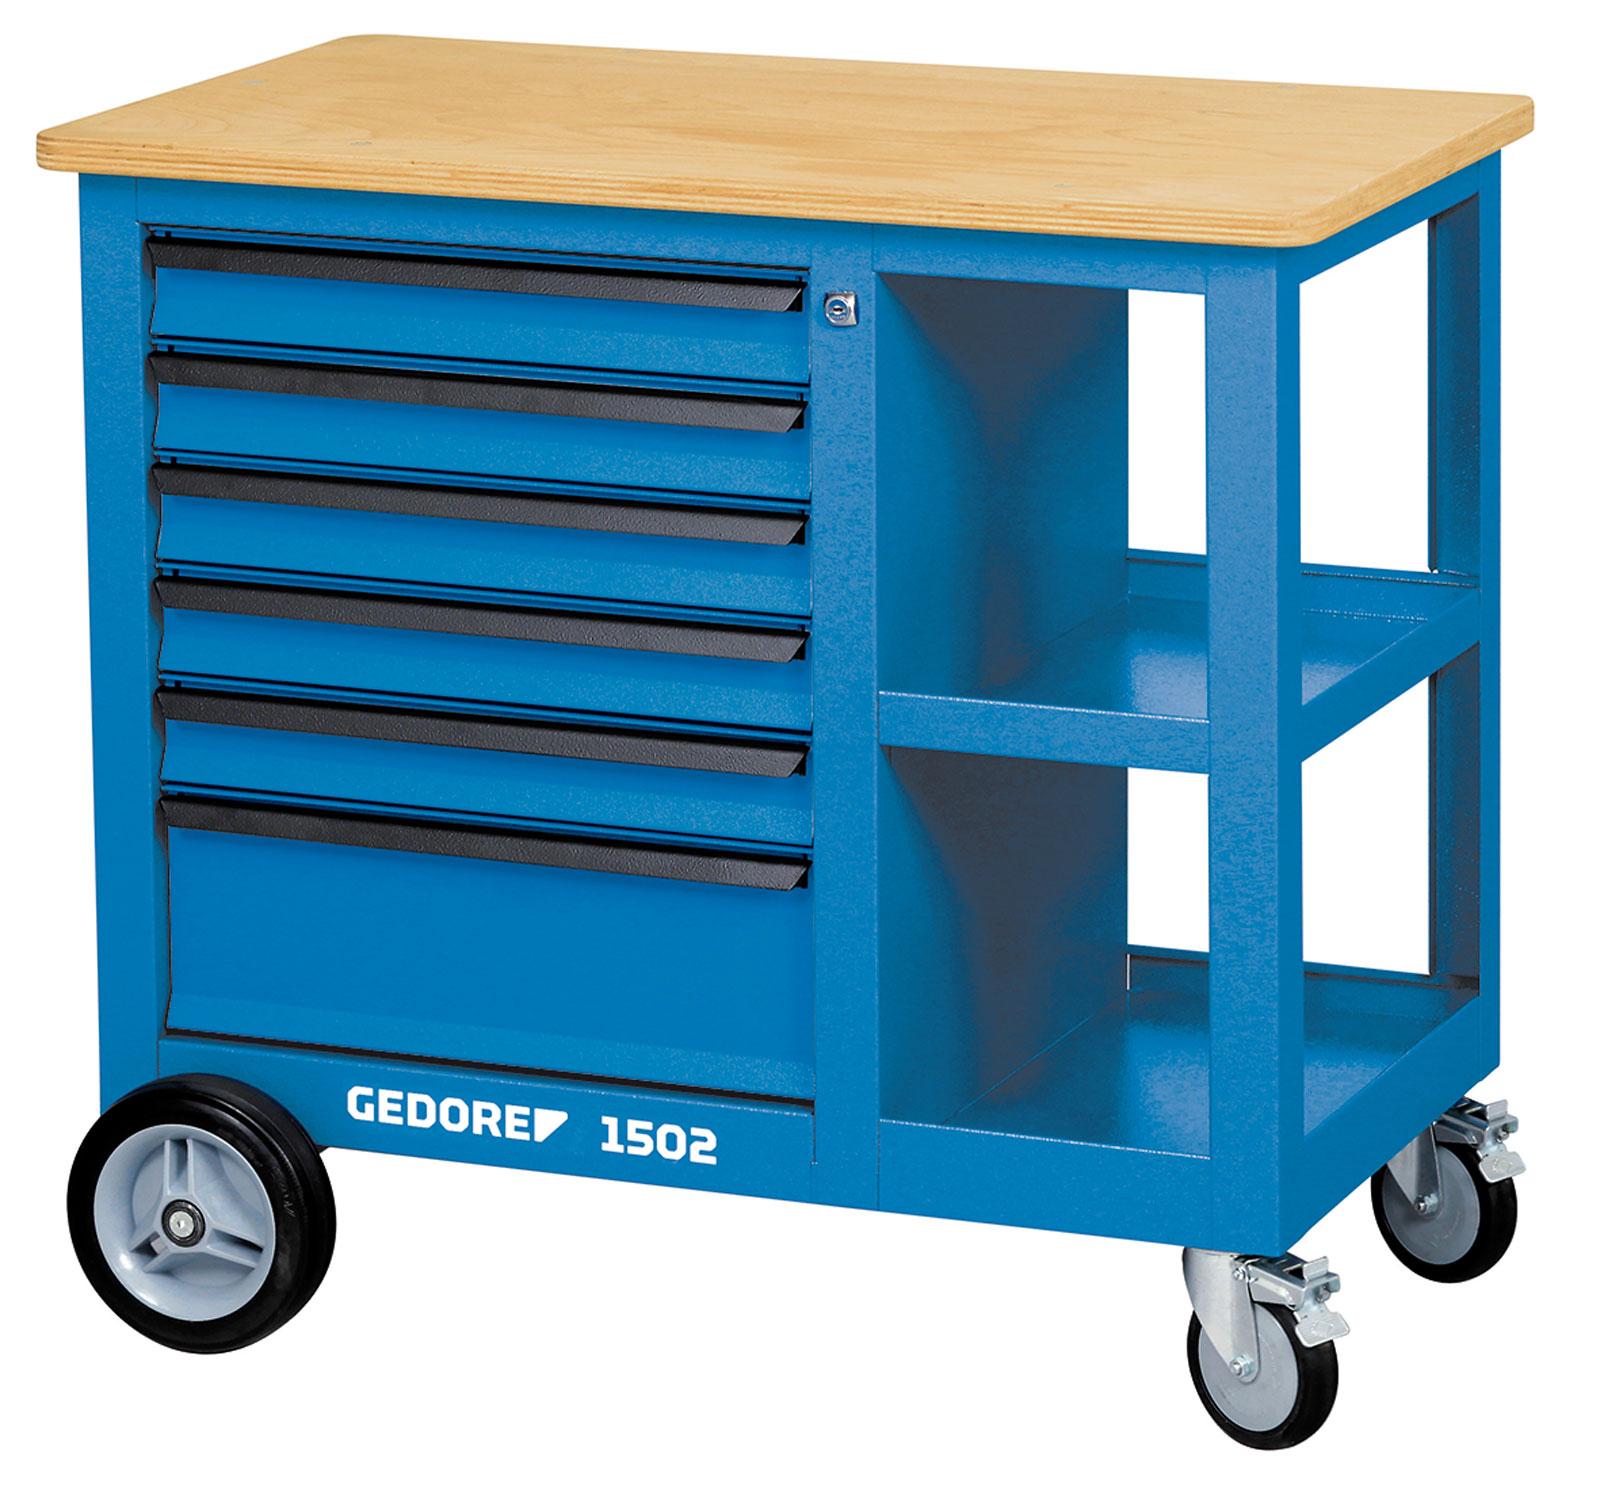 Gedore 6620540 Mobile workbench 4010886662052   eBay